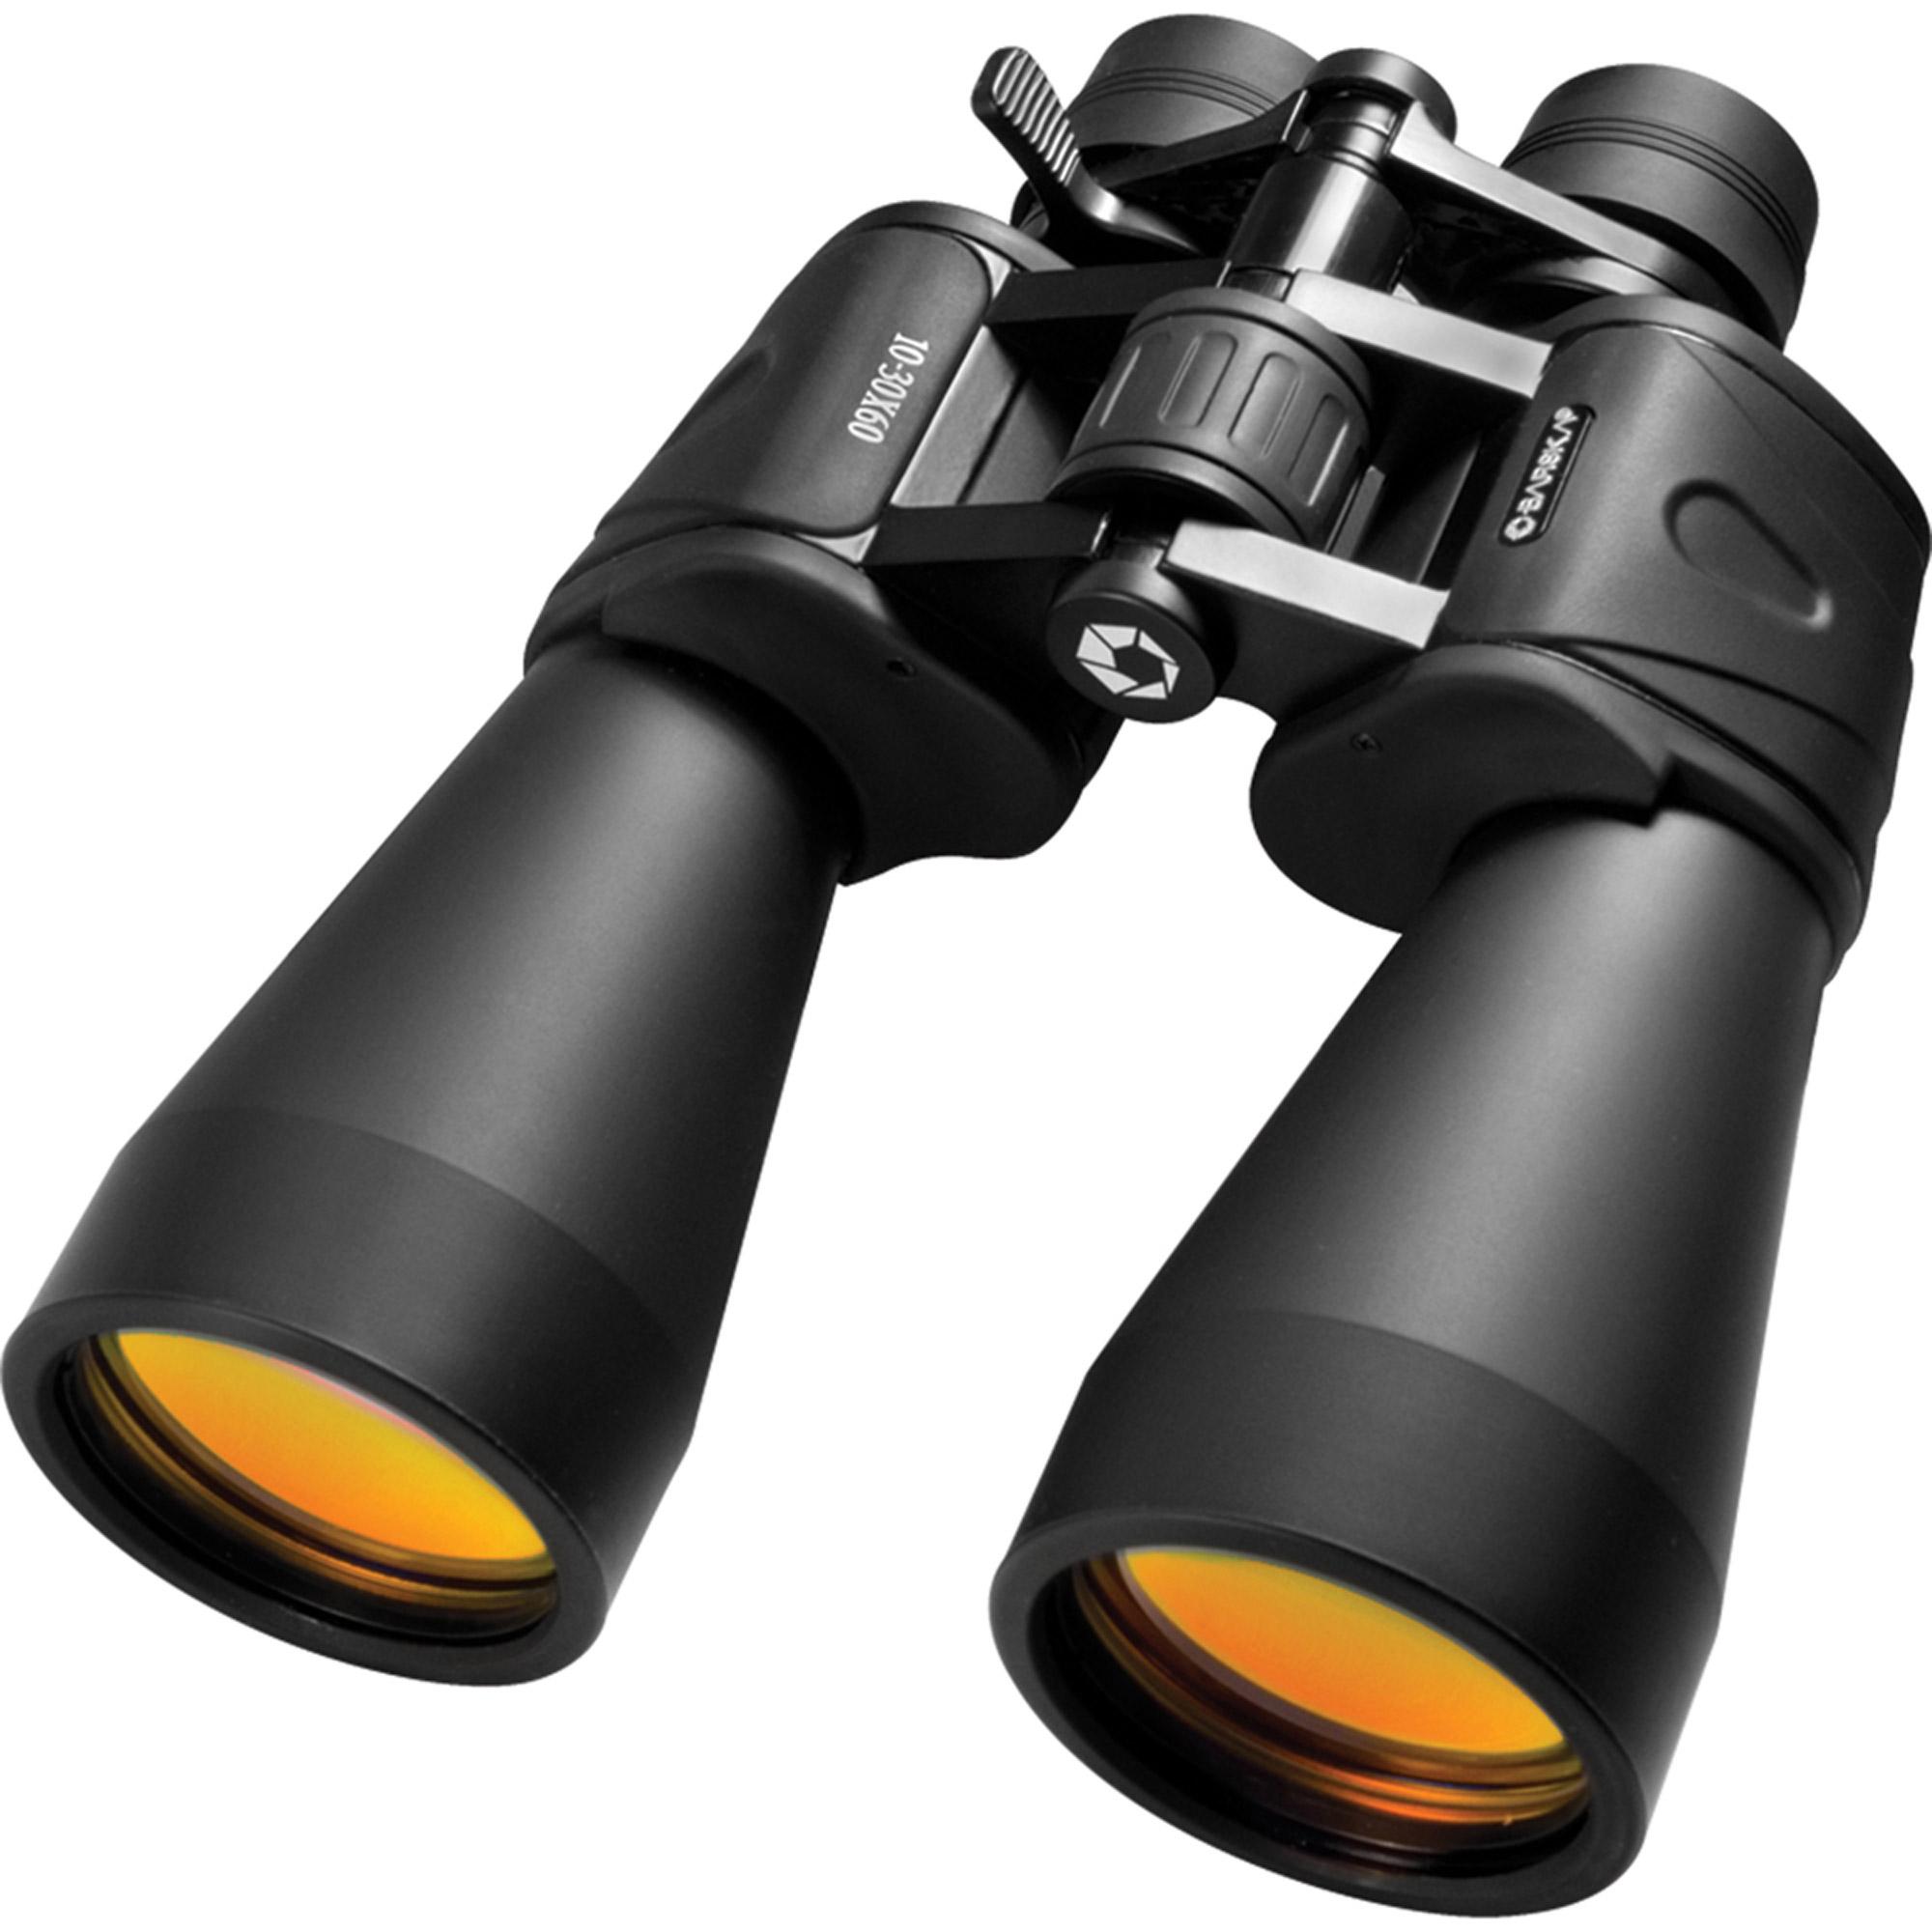 Barska Optics 10-30x60mm Binoculars, Zoom Gladiator Ruby ...